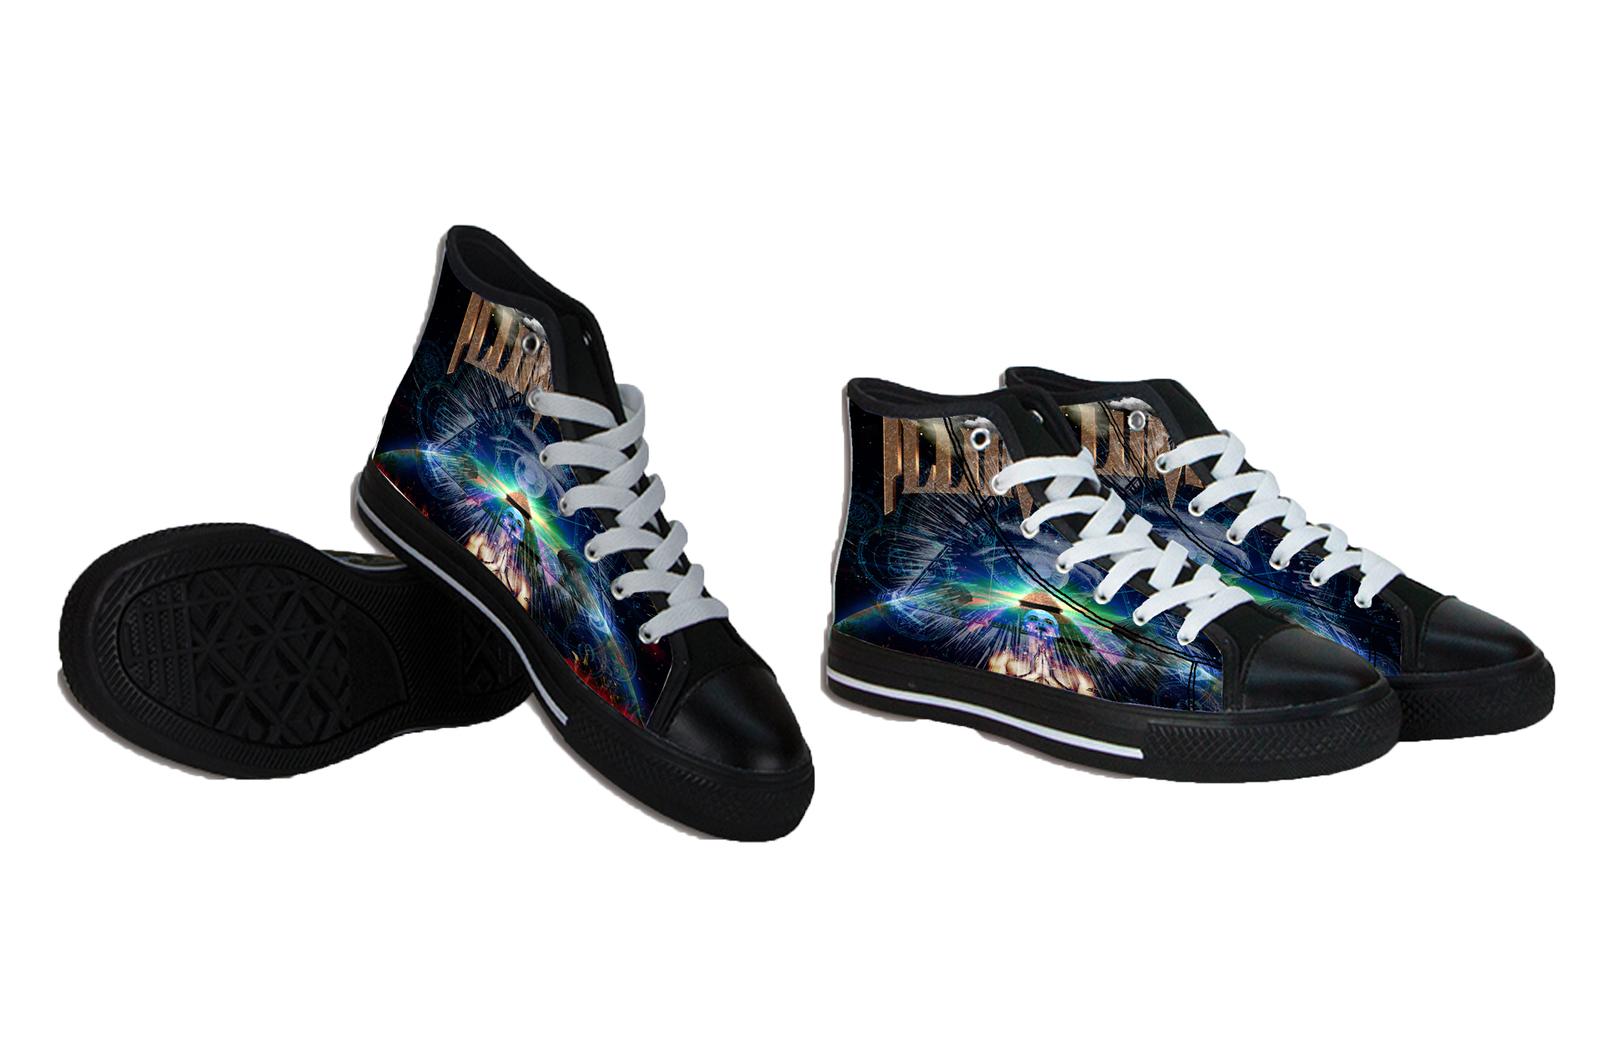 ILLUMINATI Canvas Shoes - $64.99